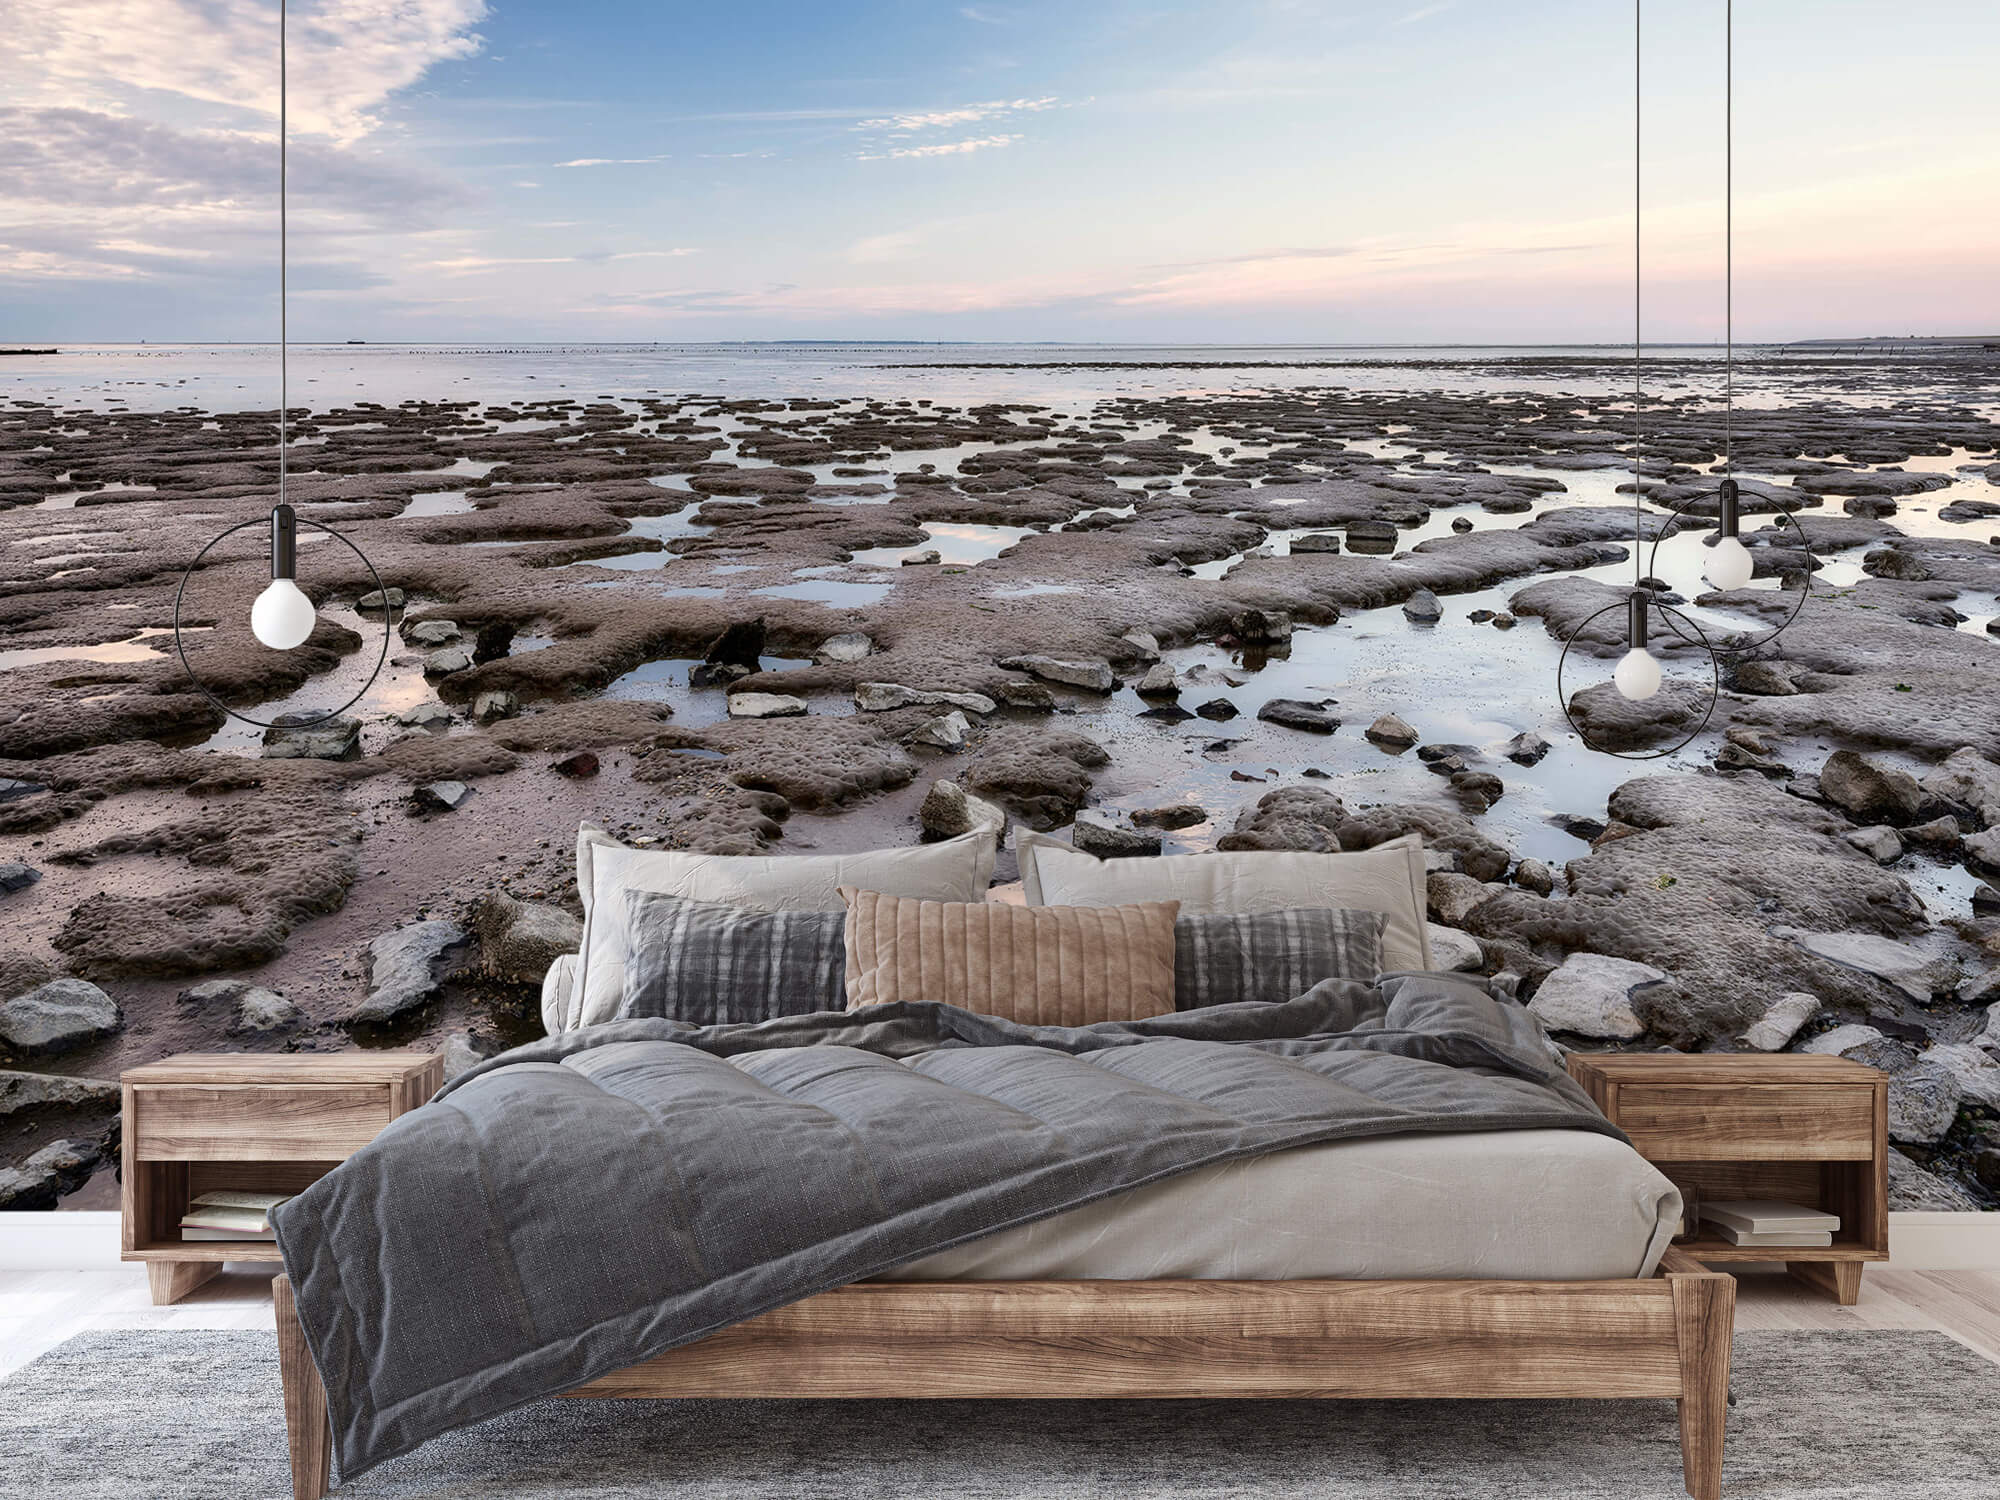 Strand - Stenen langs de kust 2